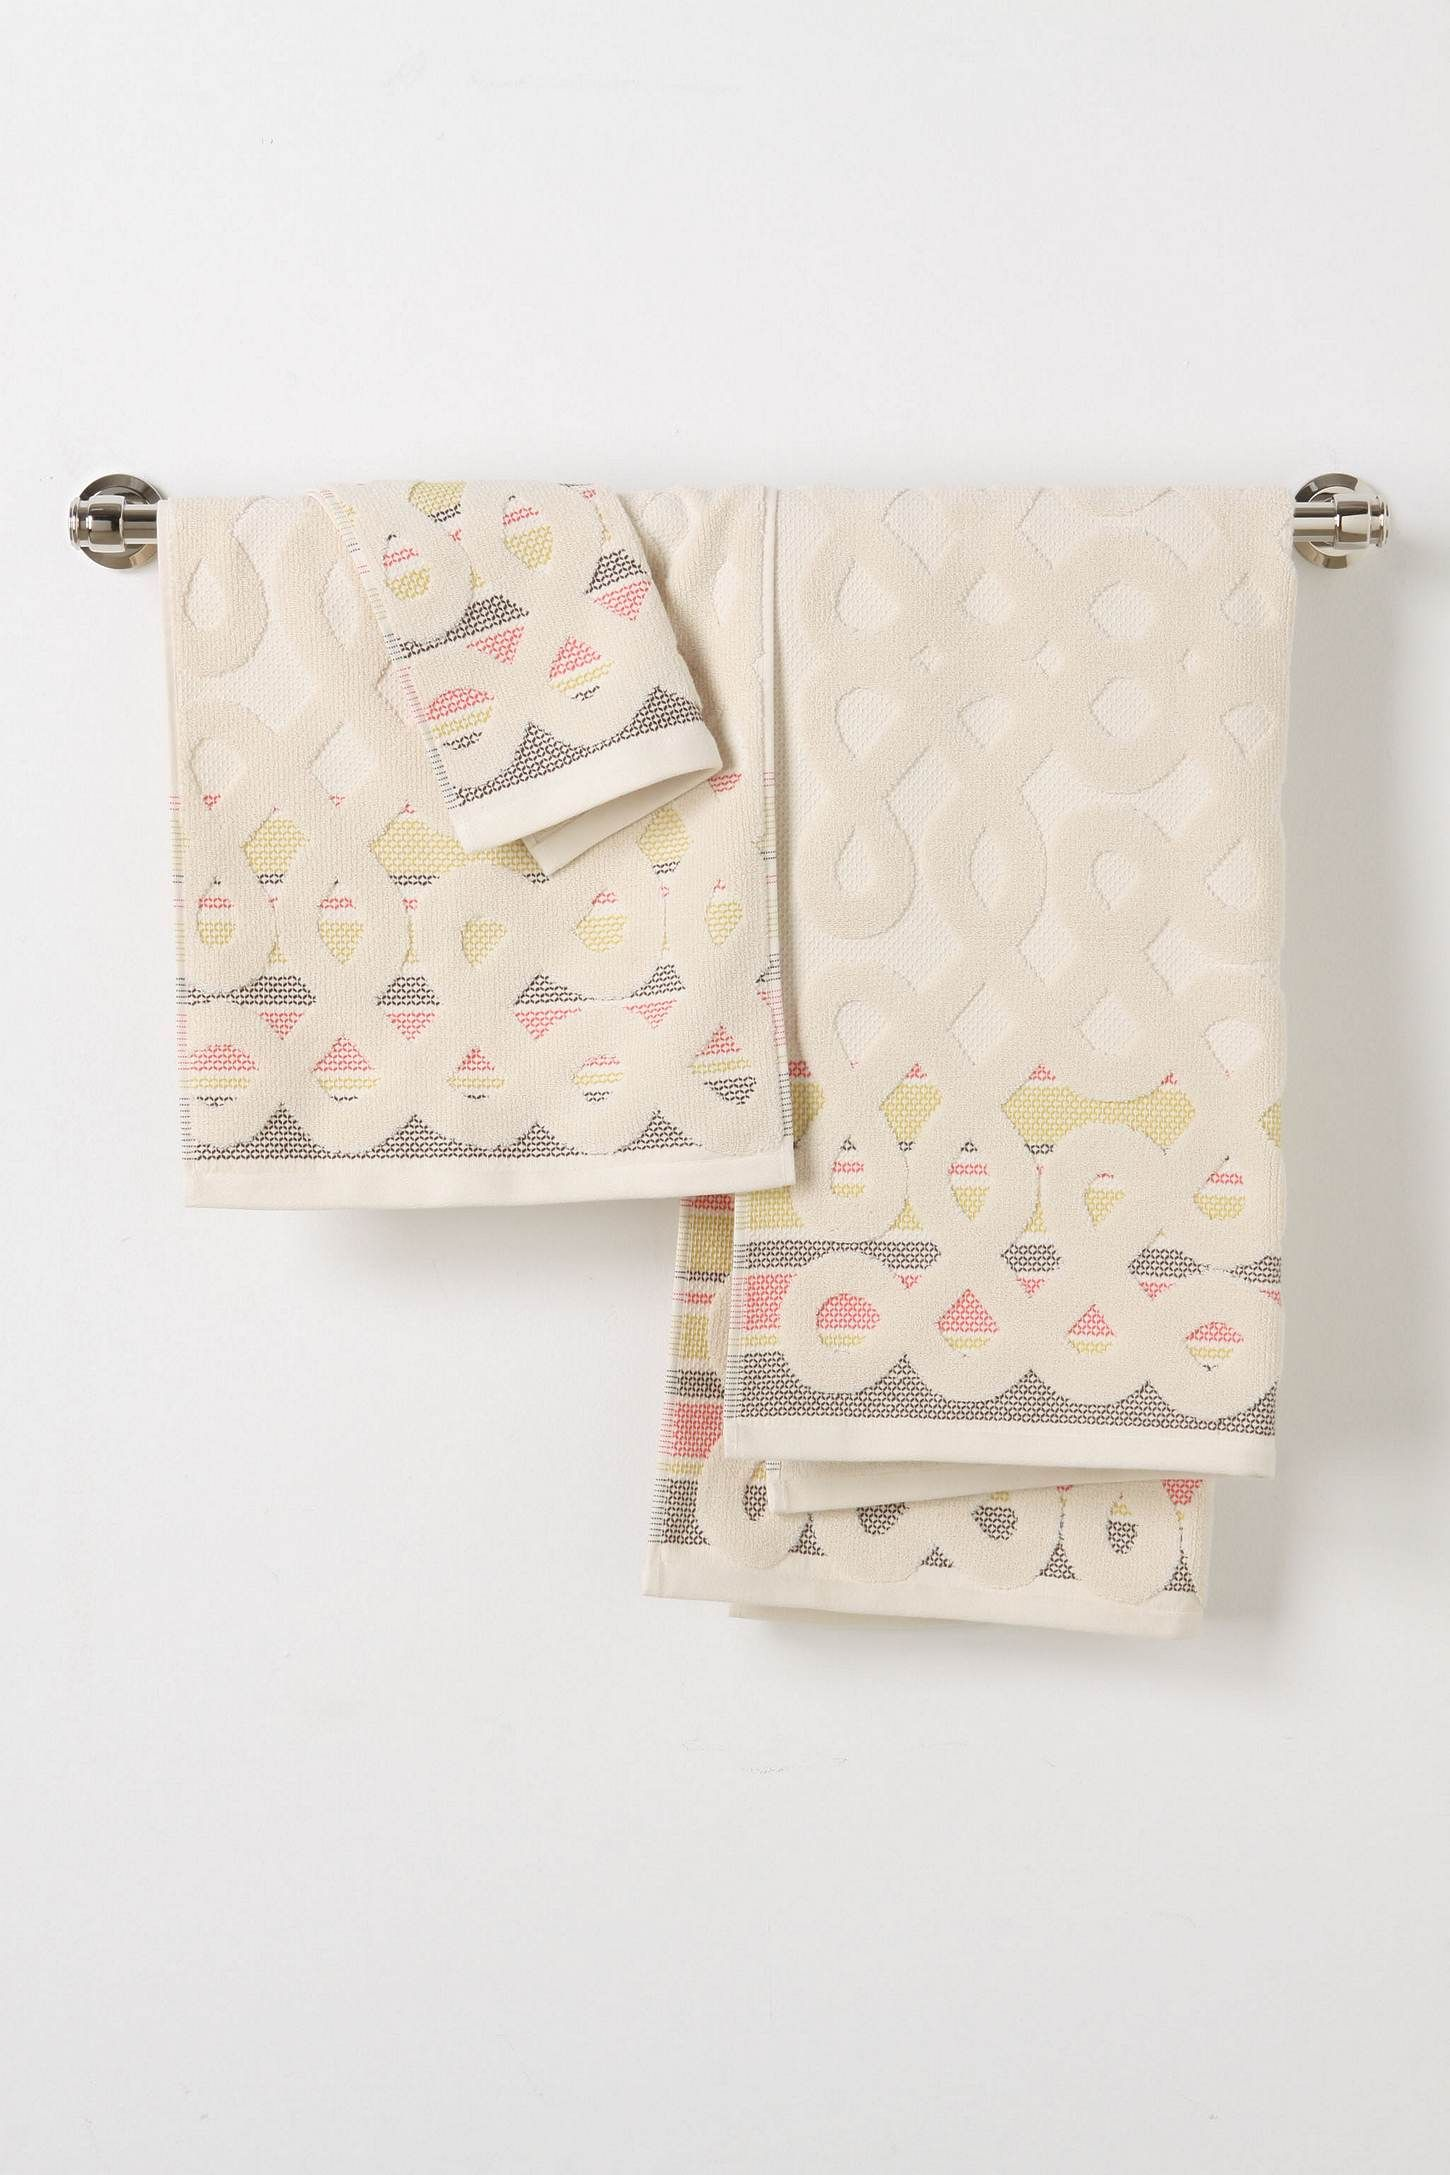 ampersand towels | Joy\'s Wishlist | Pinterest | Towels, House and Bath